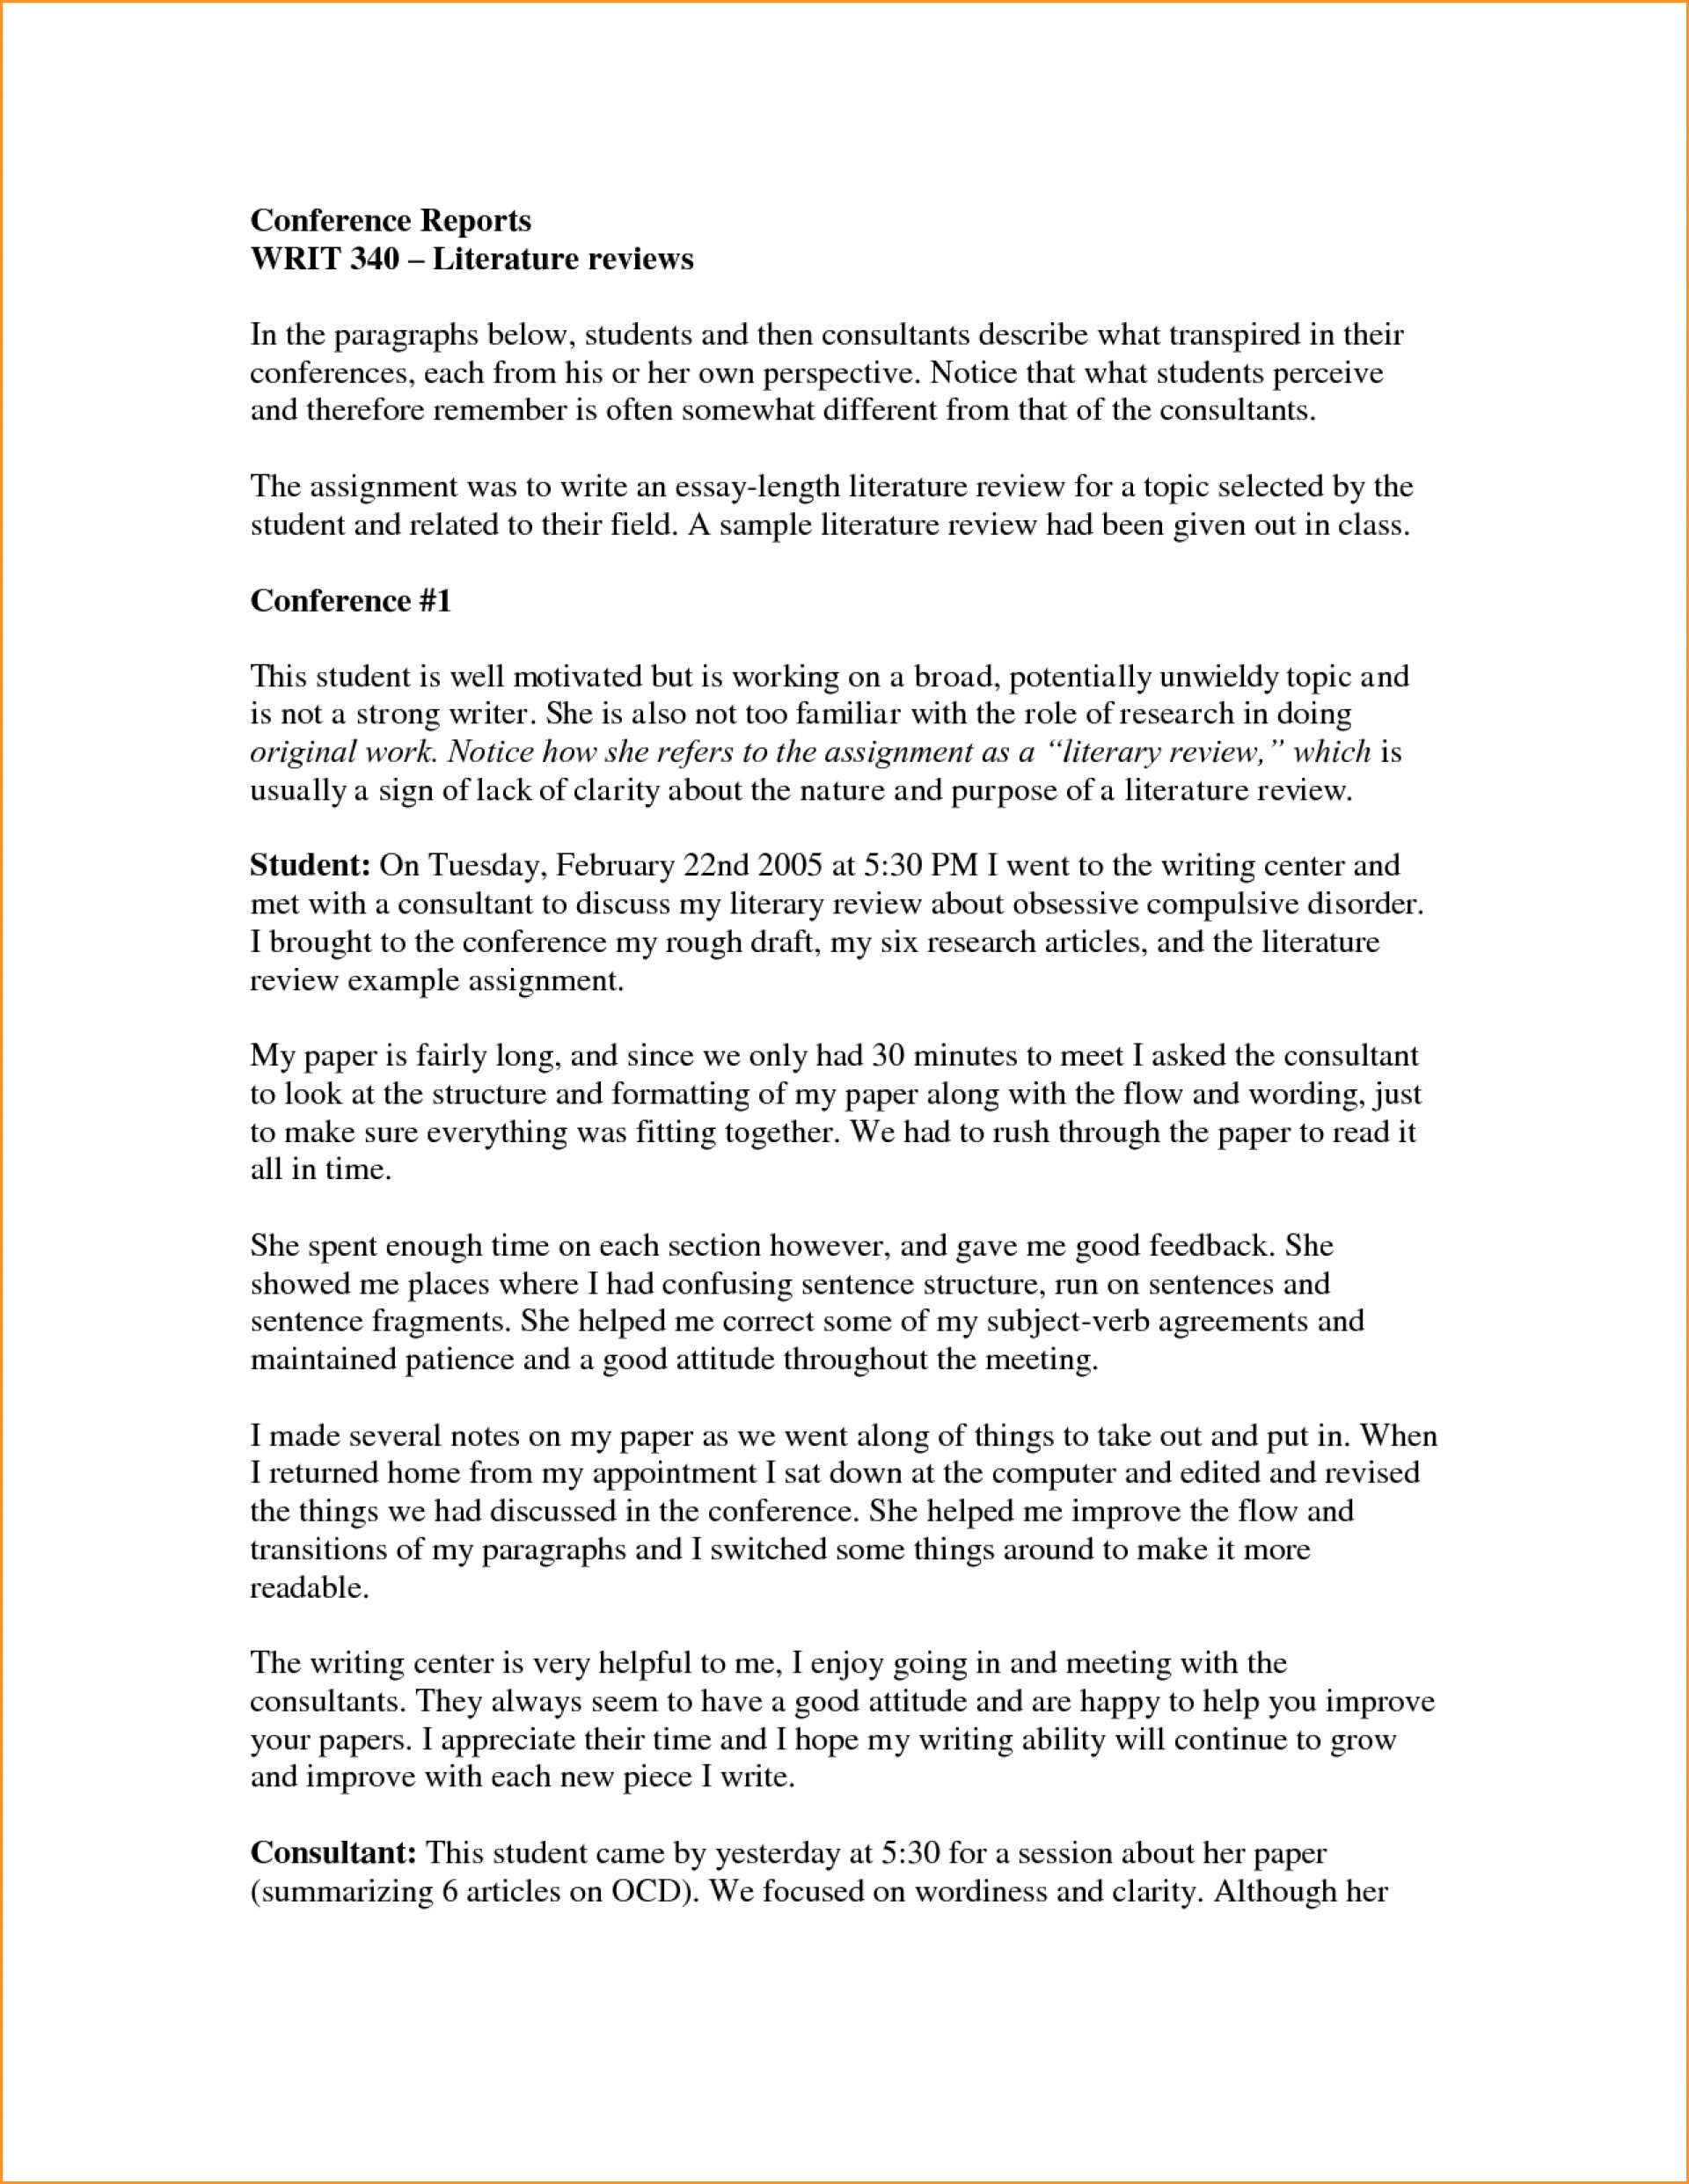 019 Sat Essay Scoress Score Sample Questions L Scoring Amazing Percentiles 2017 Examples 6 2018 1920